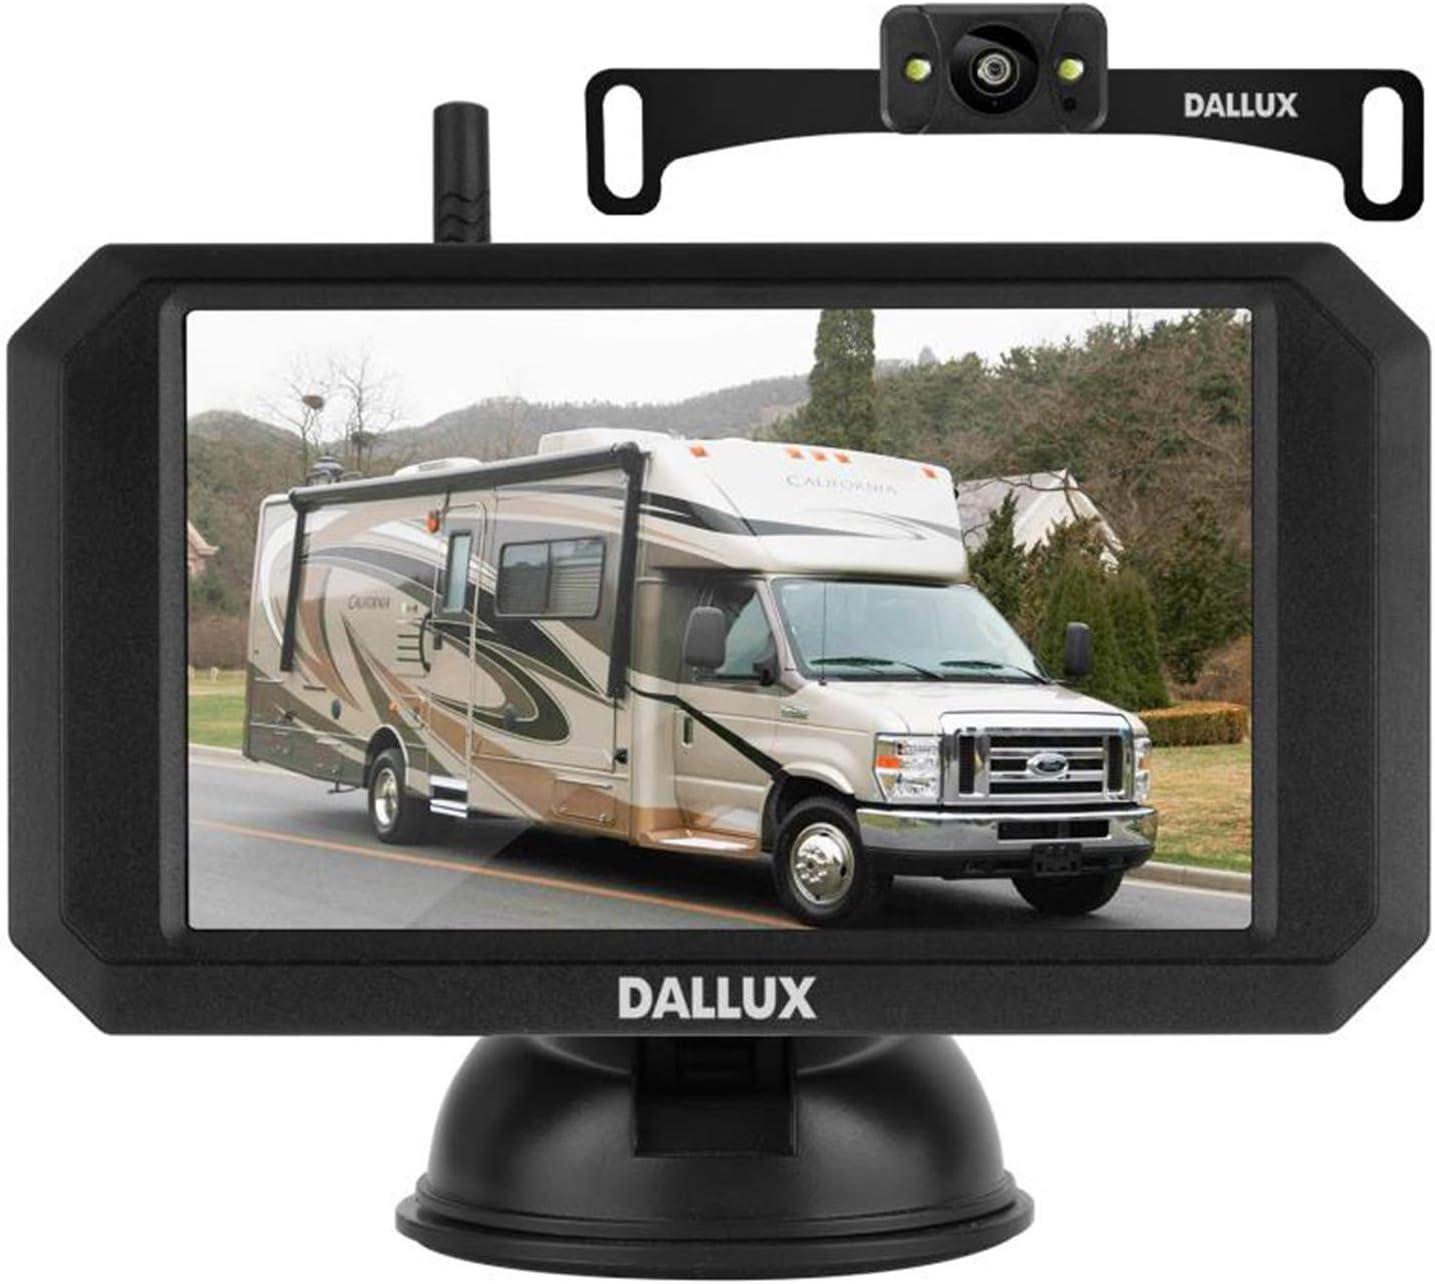 Dallux Wireless Backup Camera Reviews